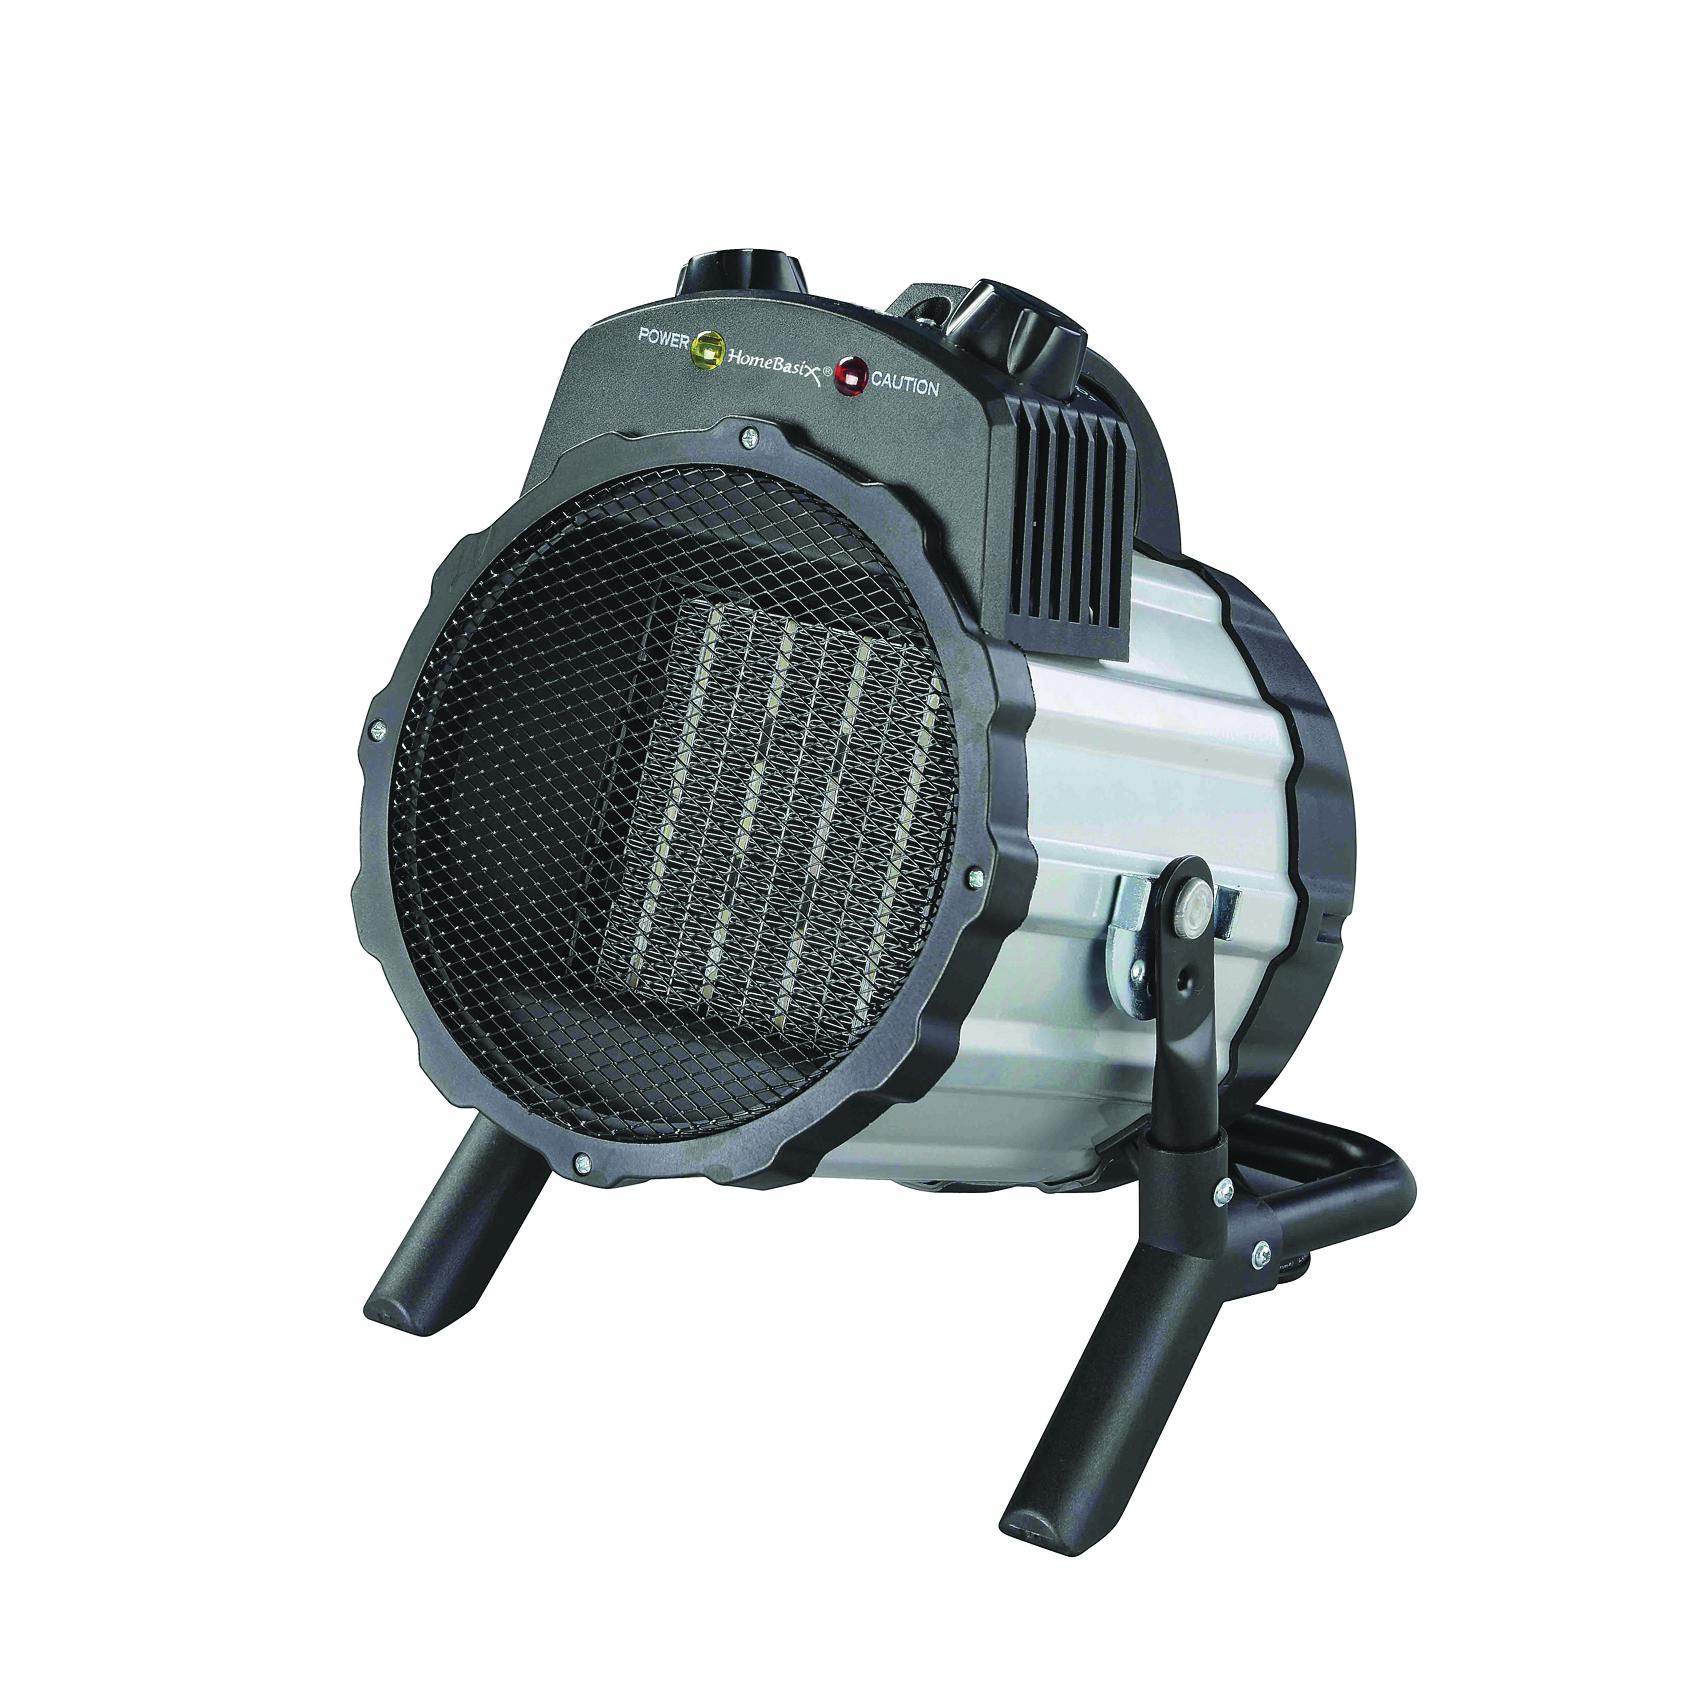 Picture of PowerZone BNT-15B2 Ceramic Utility Heater, 12.5 A, 120 V, 750/1500 W, 1500W Heating, 2-Heat Setting, Grey